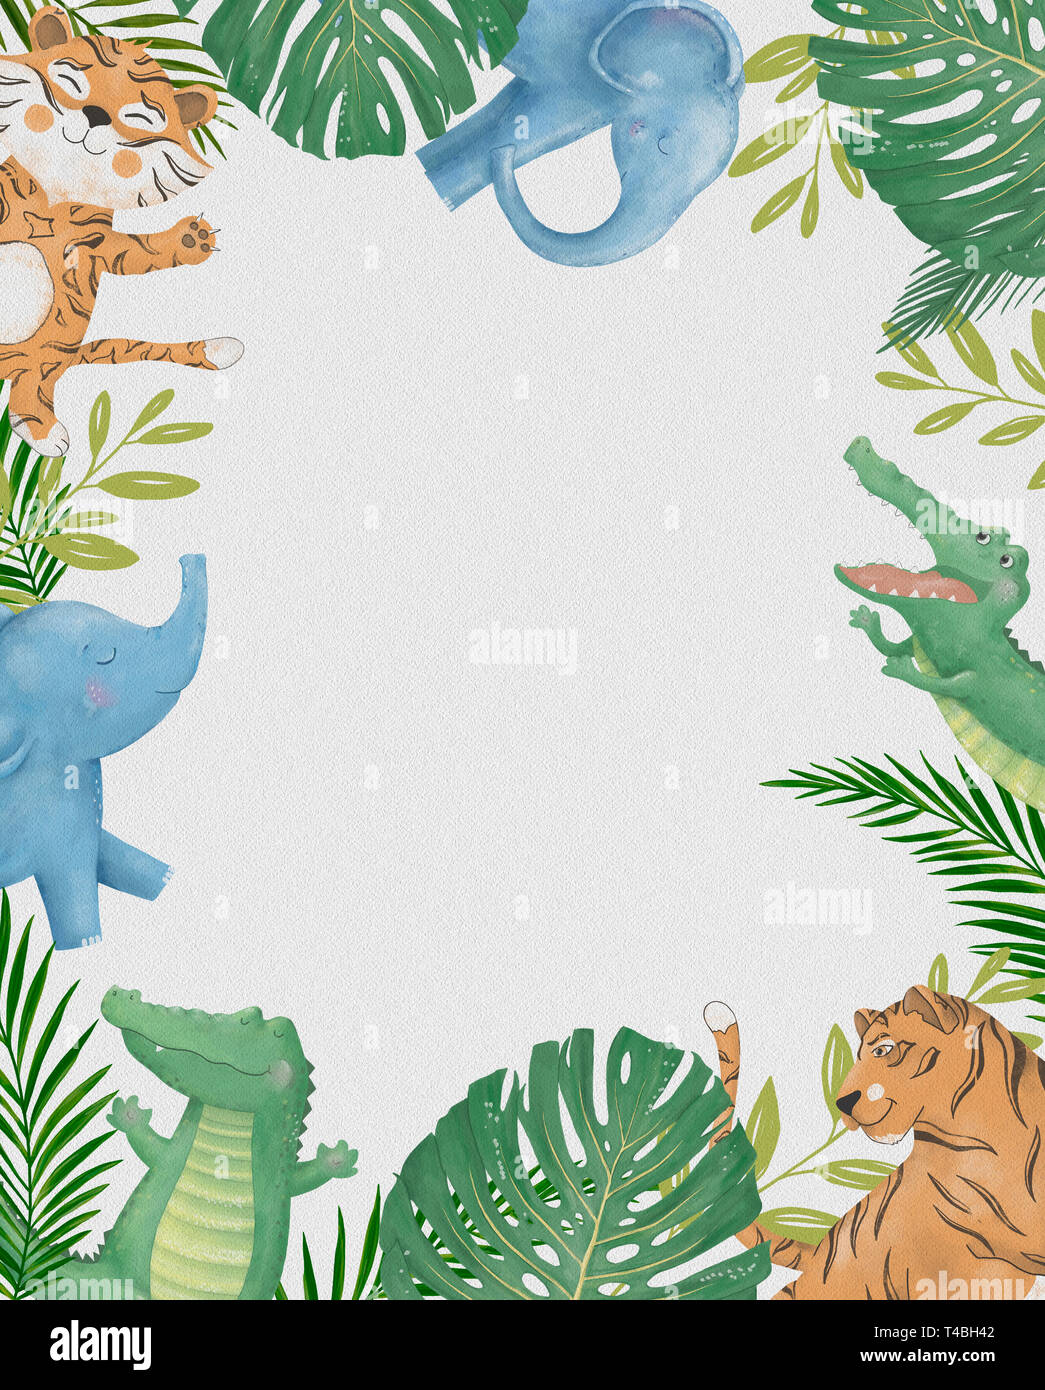 Safari Lindo Animales De Dibujos Animados Frontera Con Forma